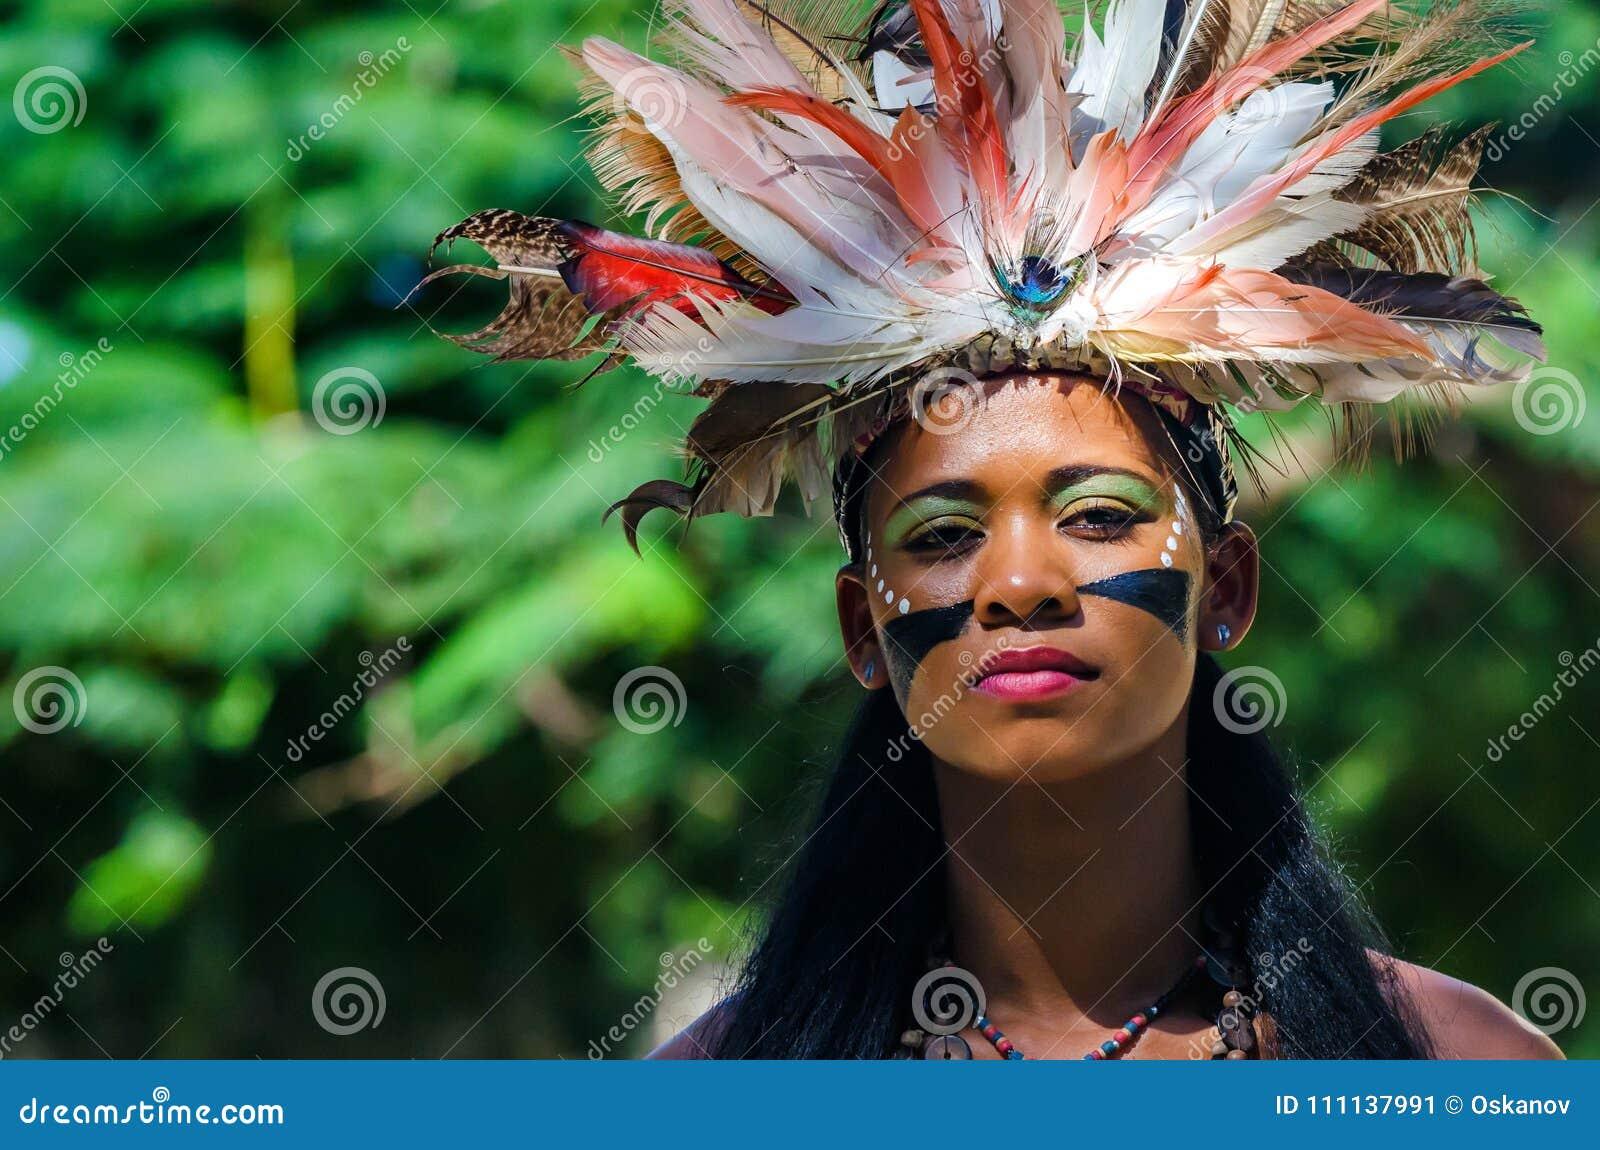 SANTO DOMINGO, DOMINICAN REPUBLIC - OCTOBER 29, 2015:Young beautiful Creol woman